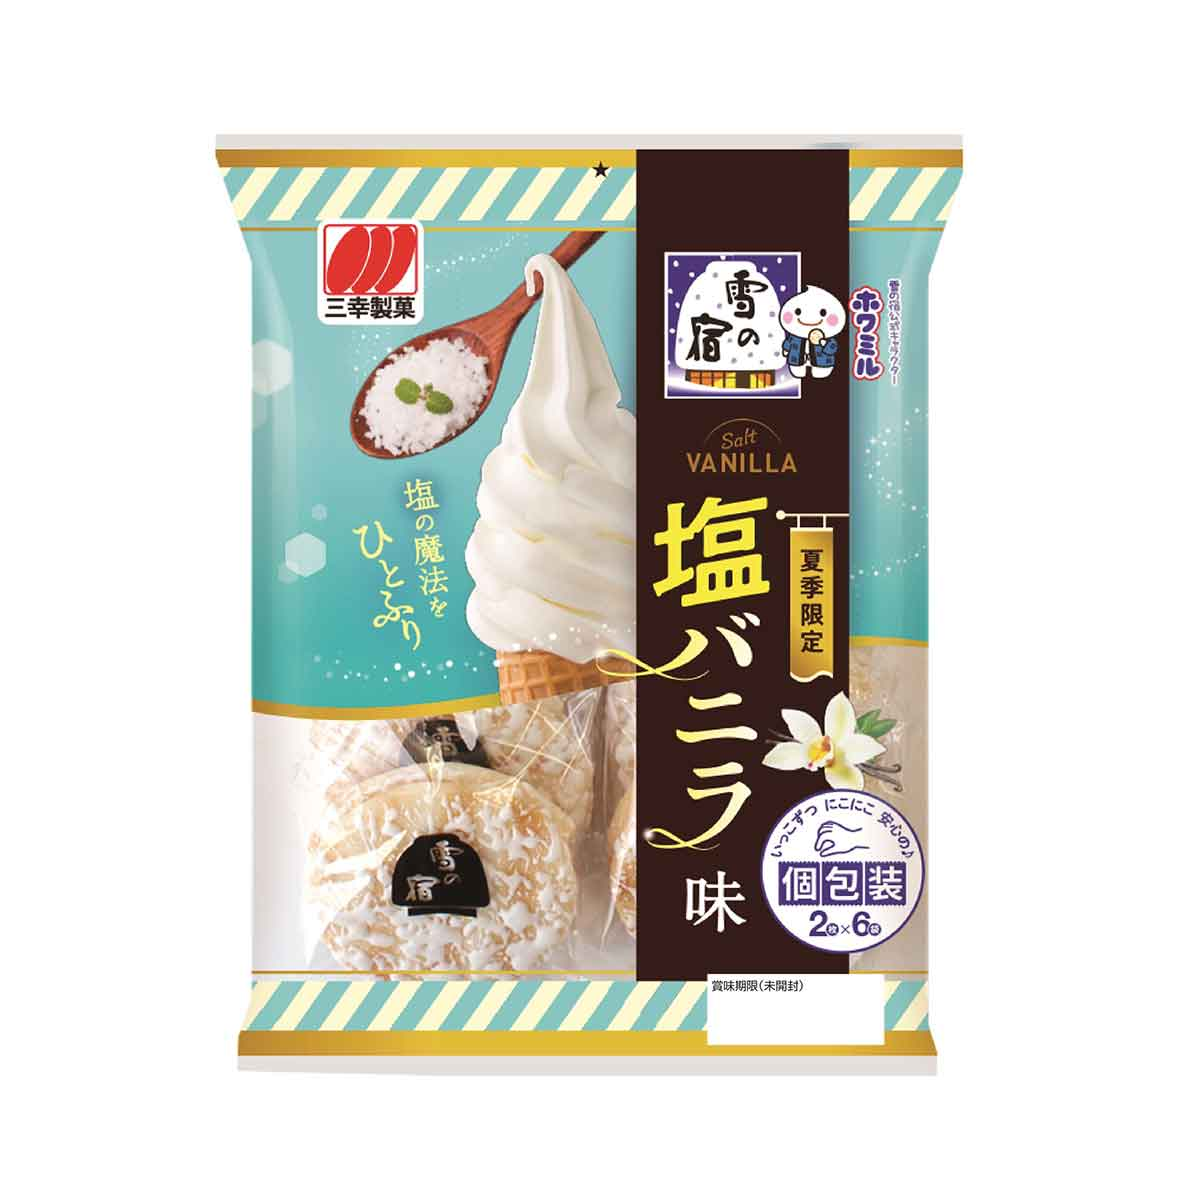 米果 香草鹽味-塩バニラ味 雪の宿 三幸製果 日本進口製造